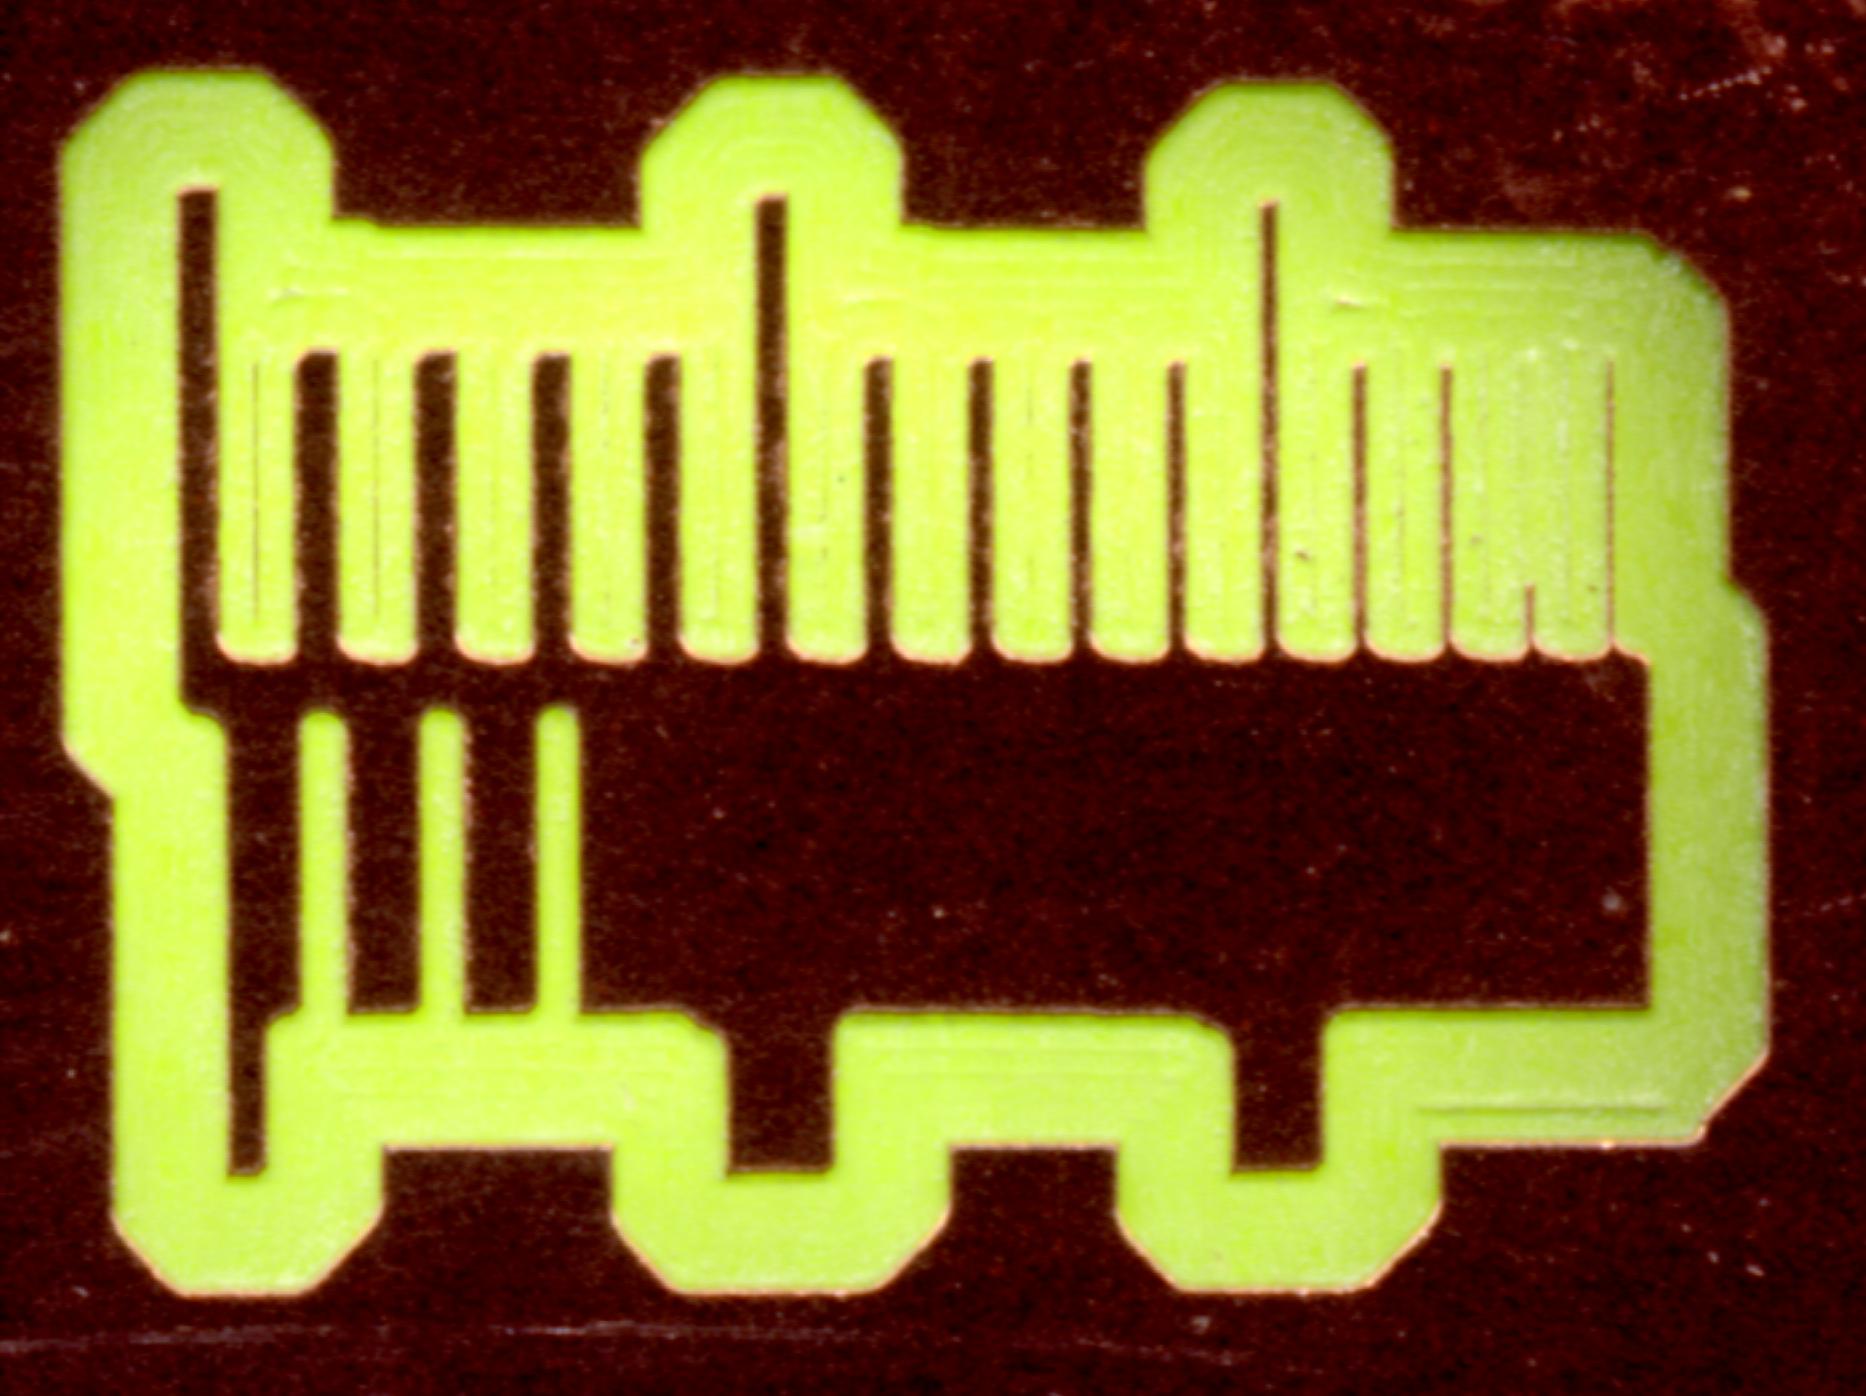 Calibrating PCB isolation routing with Eagle/pcb-gcode